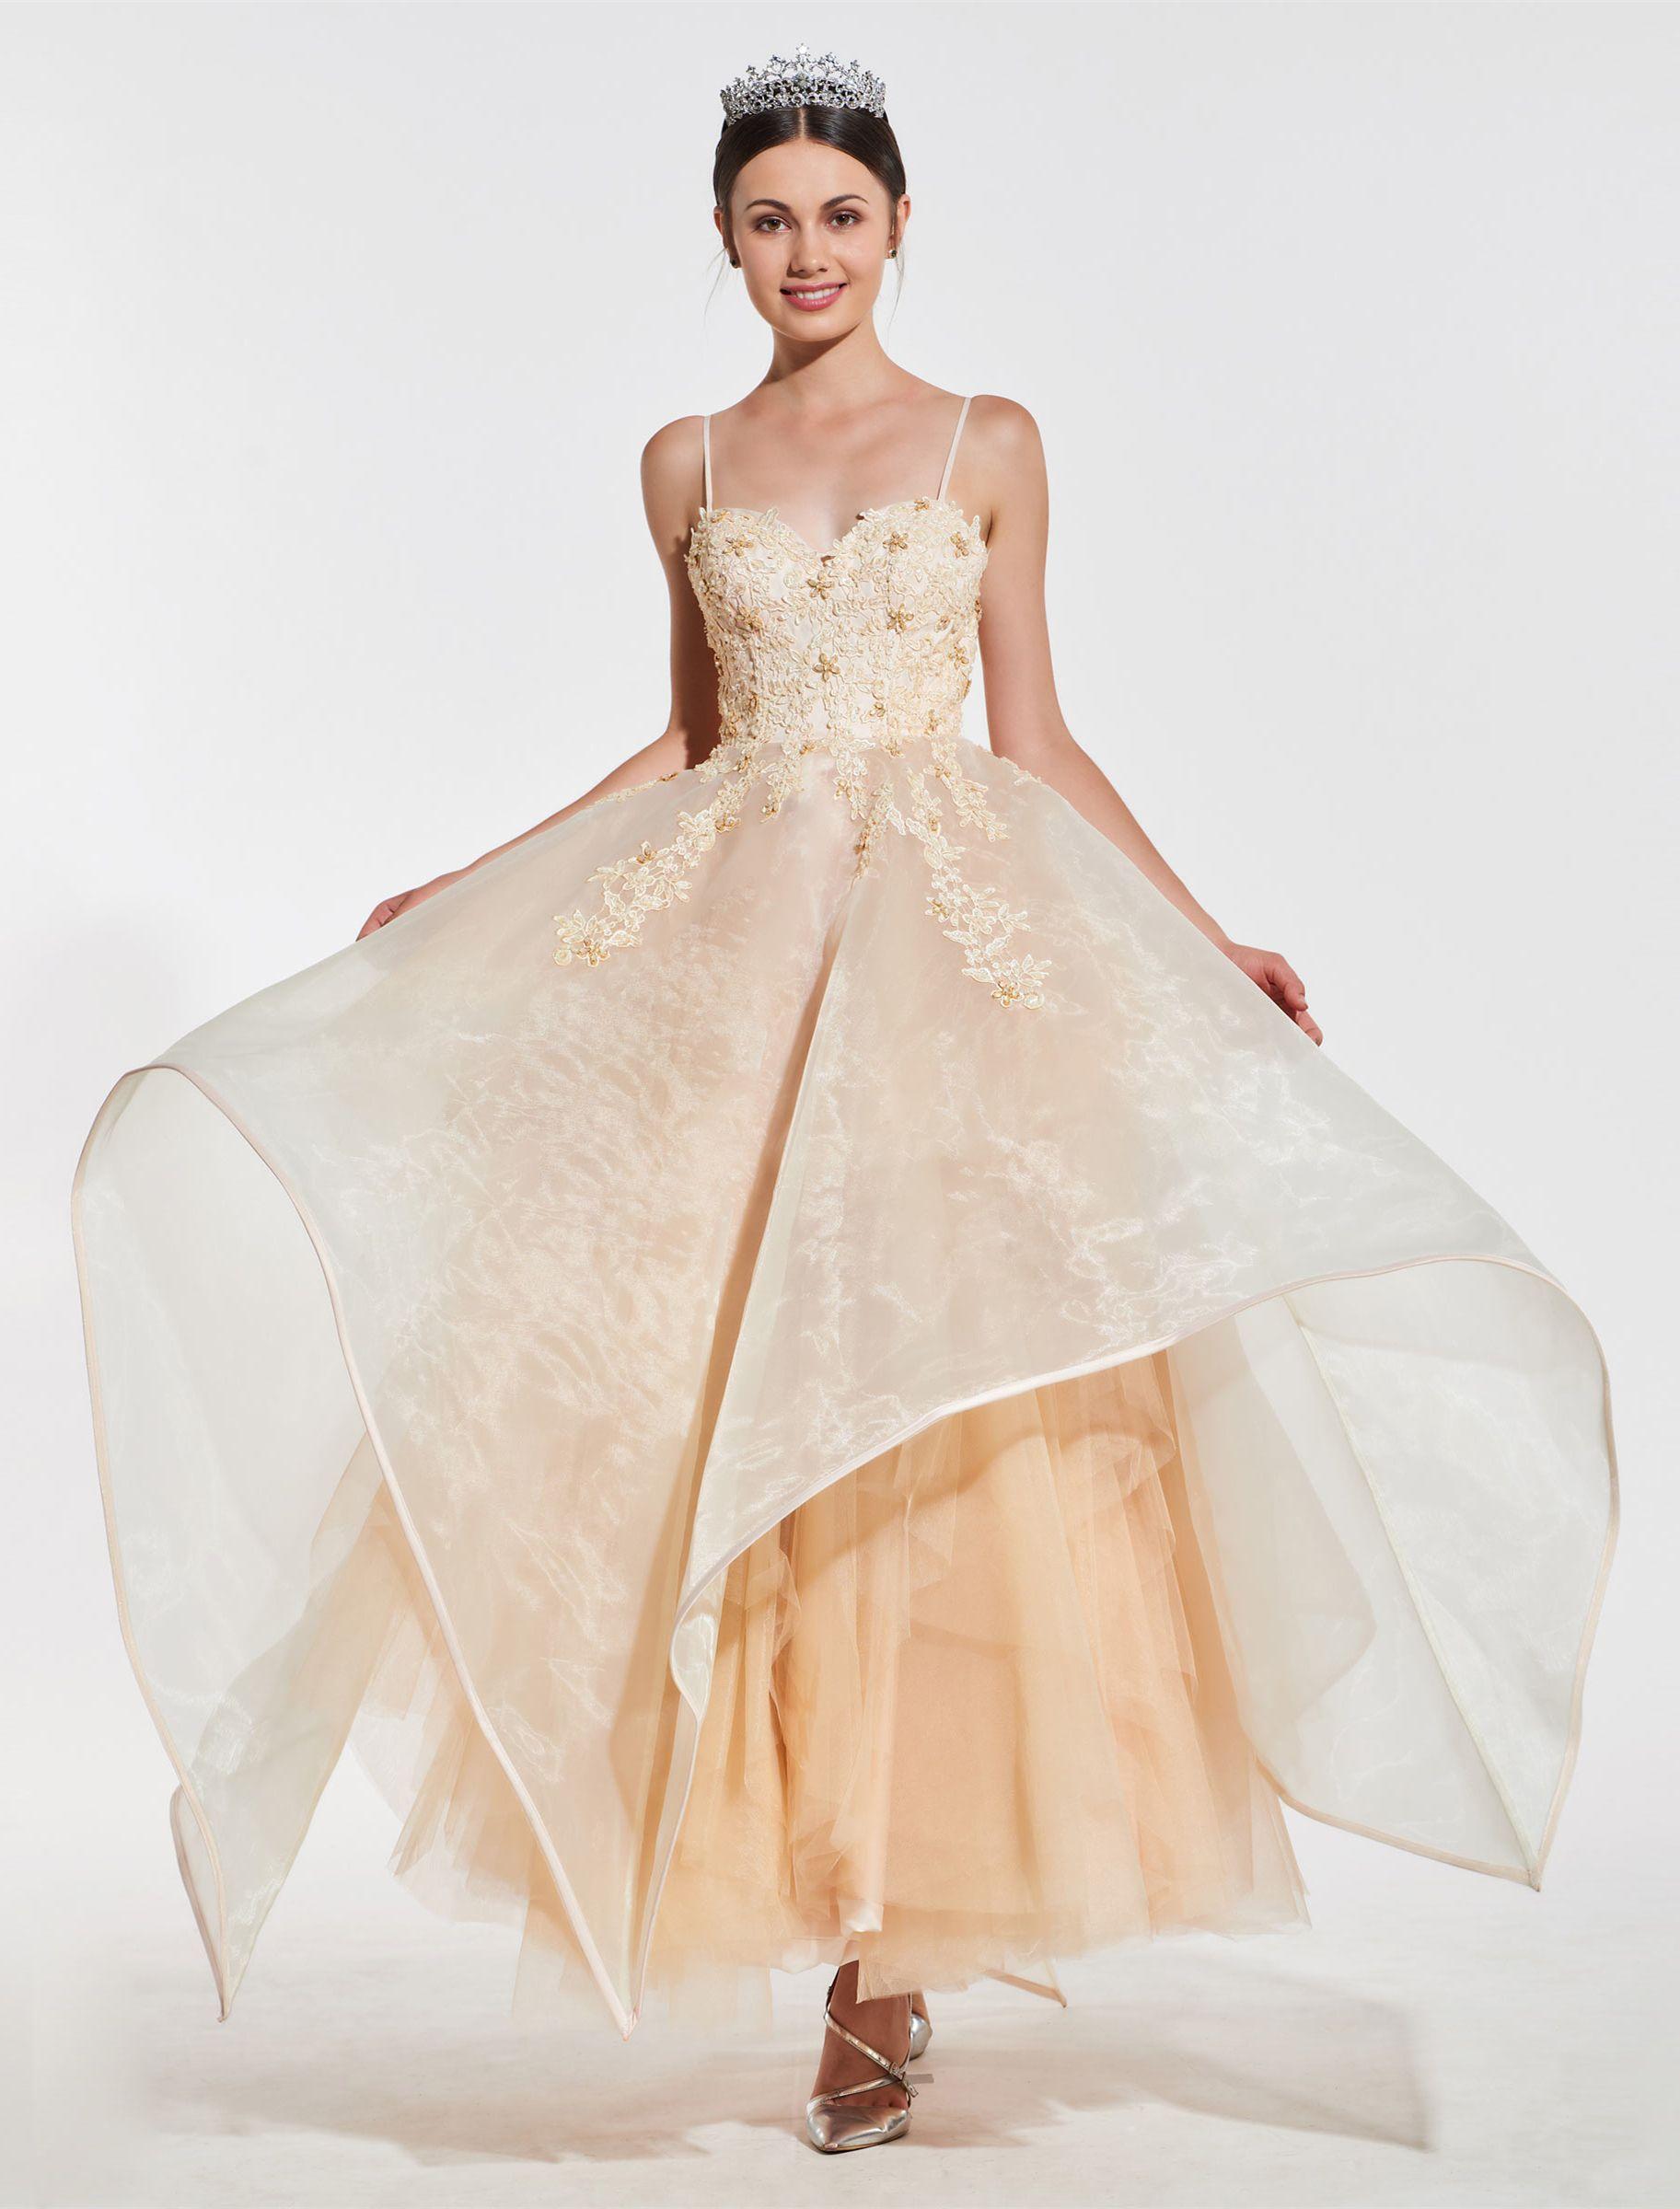 Beaded spaghetti strap wedding dresses  Spaghetti Straps Appliques Beading Quinceanera Dress  Dresses